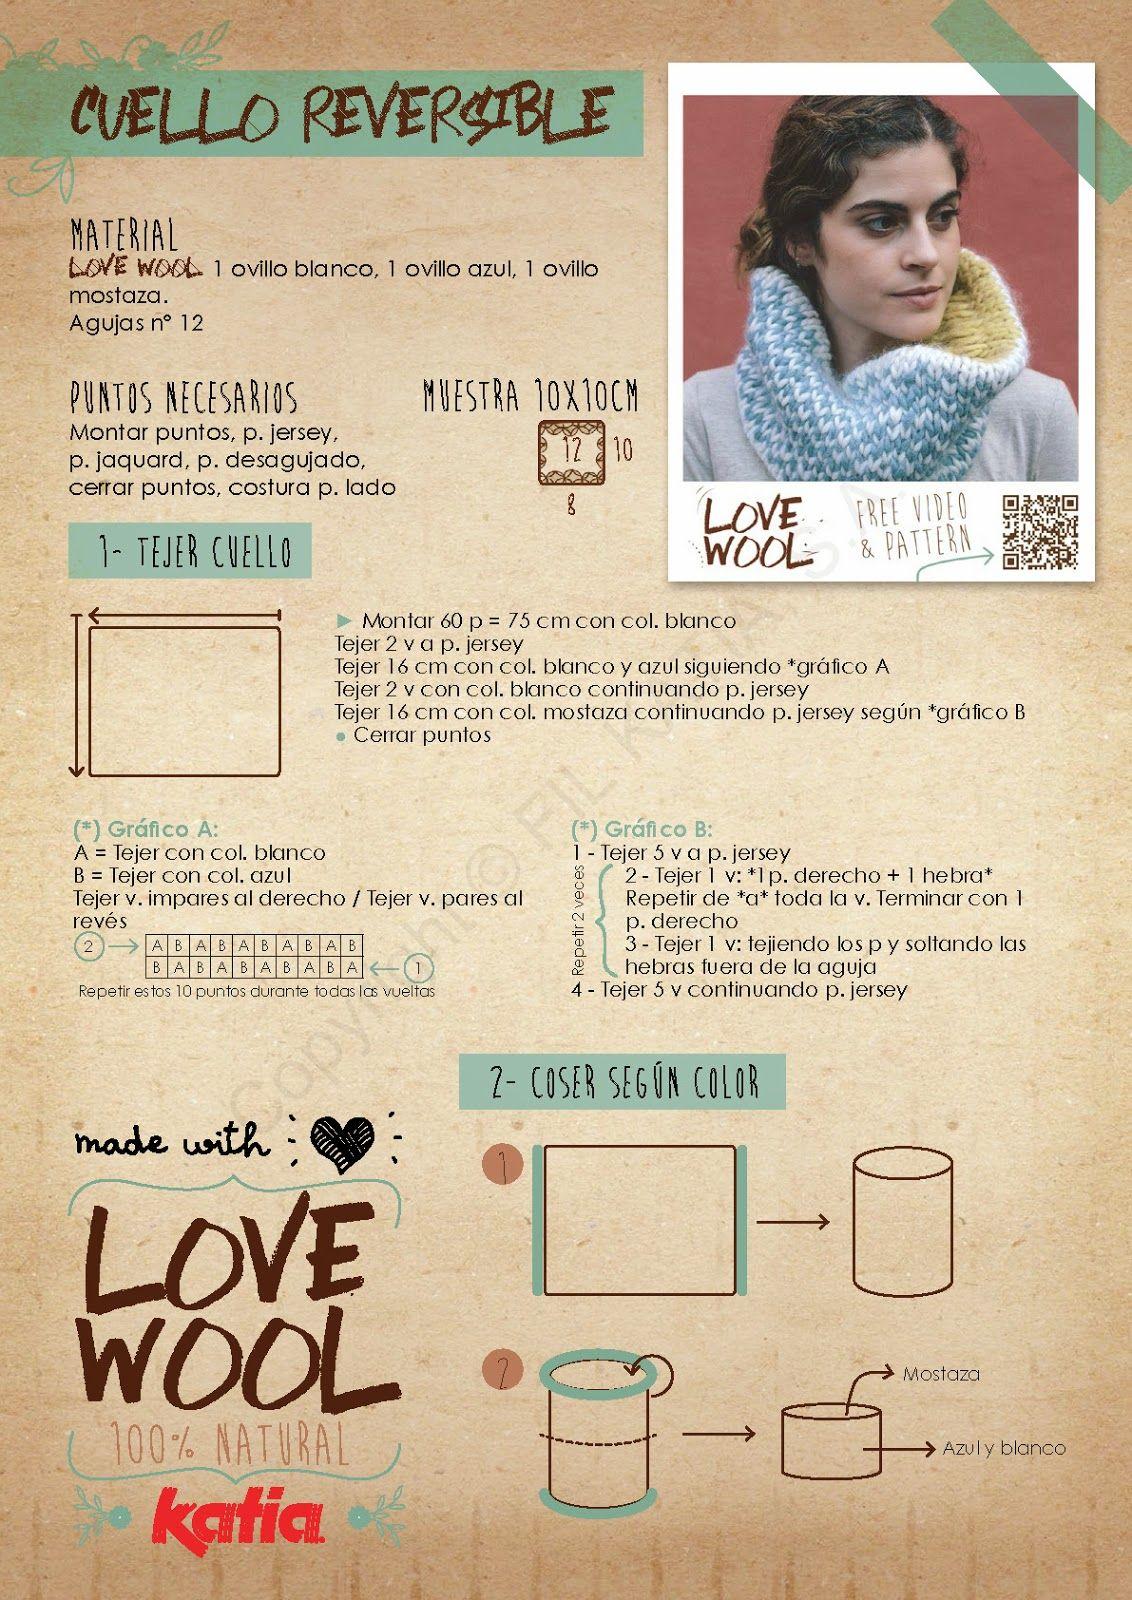 Kubaloo: LOVE WOOL by KATIA - Capítulo 1 | KUBALOO | Pinterest ...